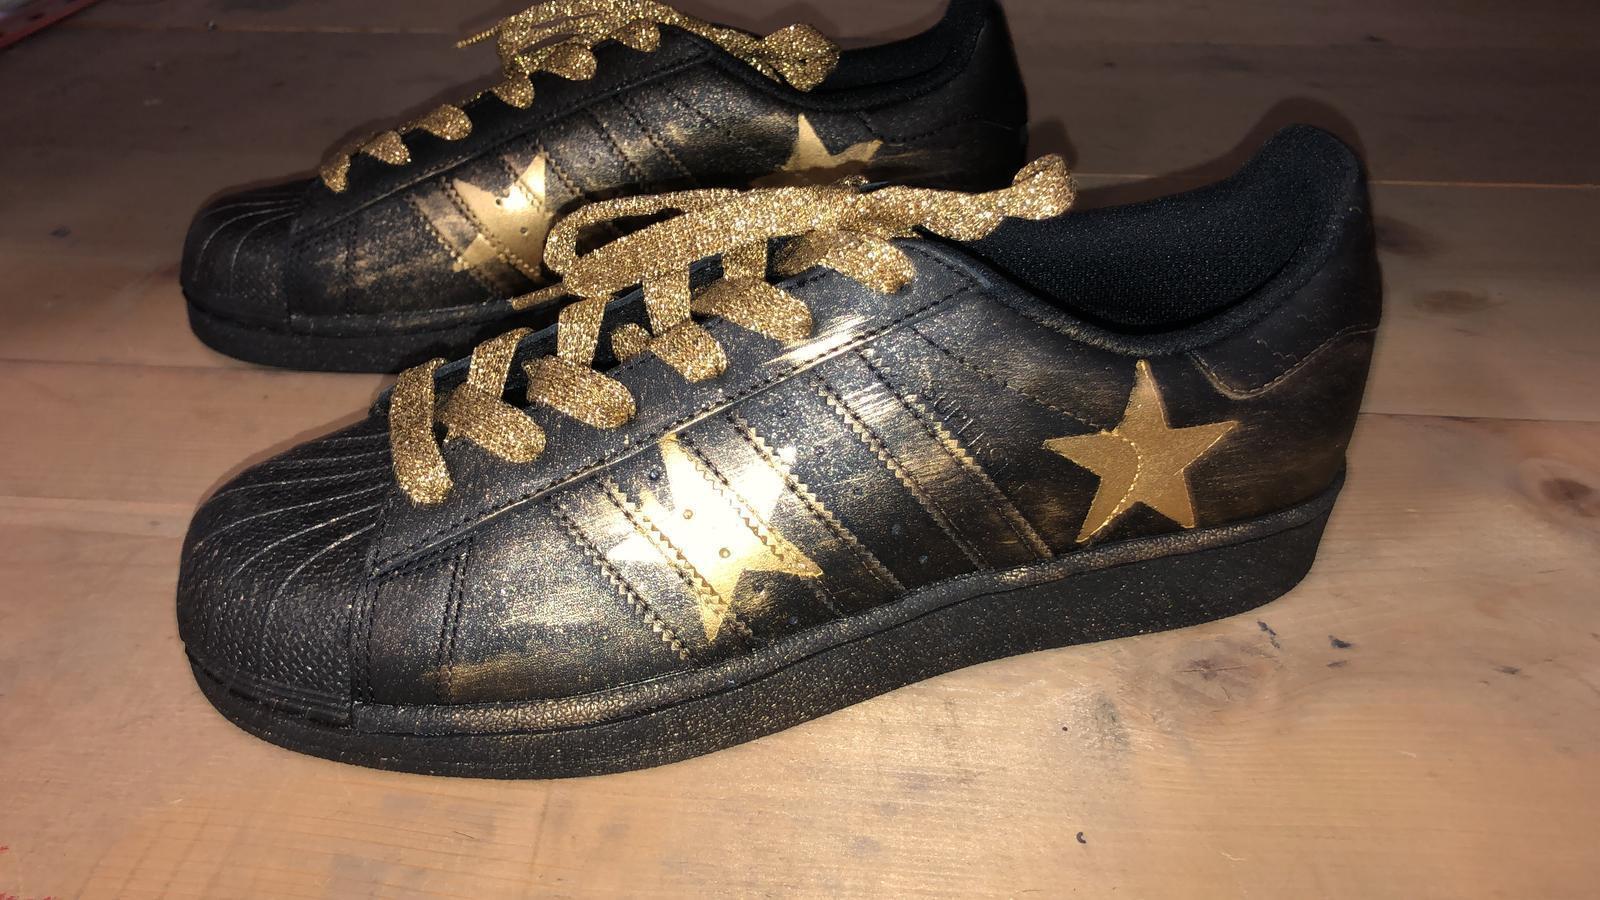 schuhe adidas superstar nere con spruzzatura Gold